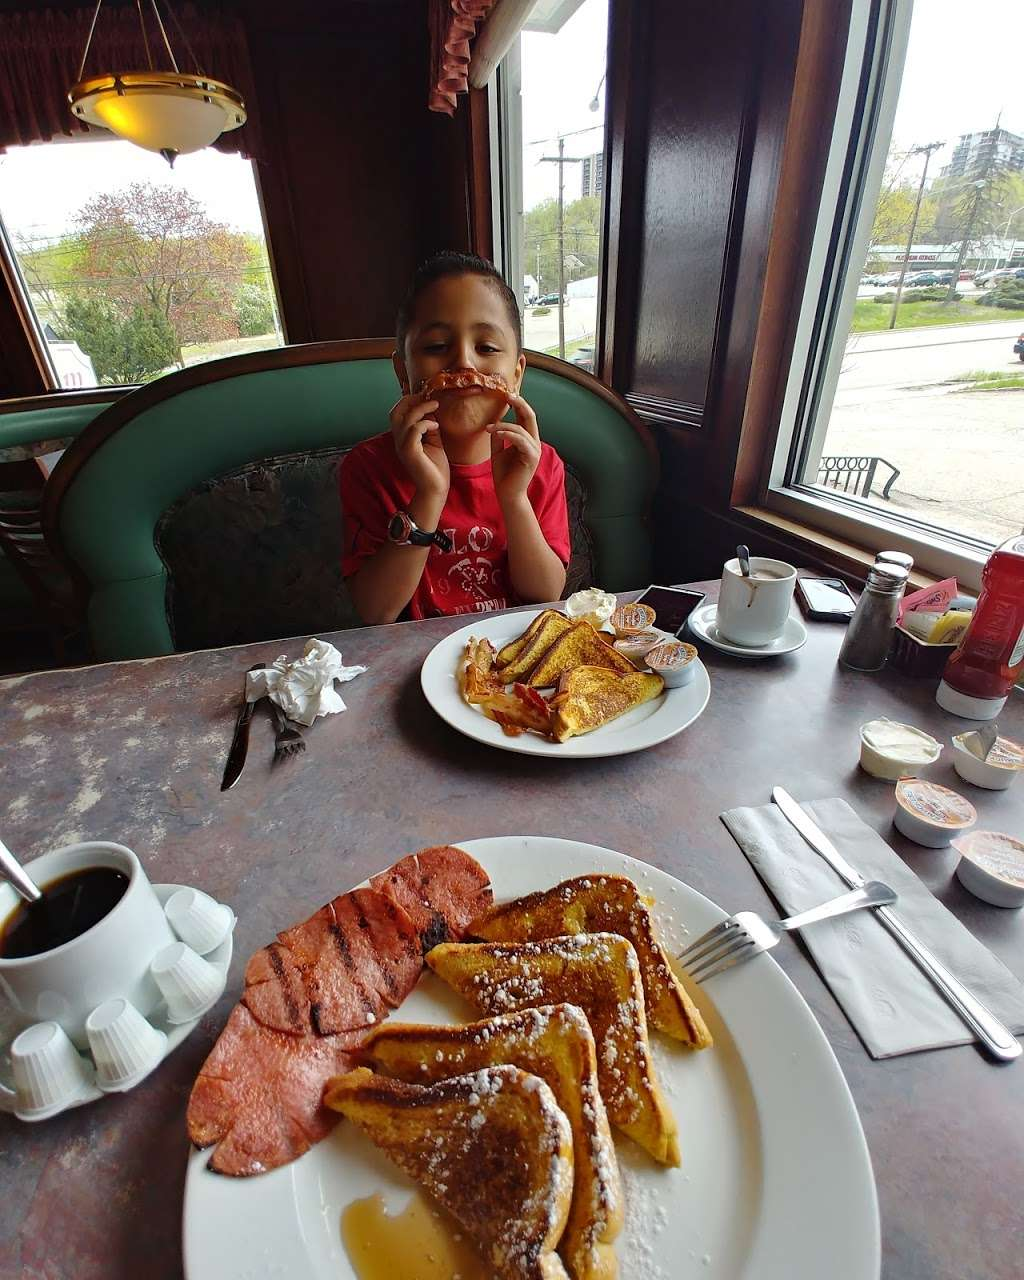 Pilgrim Diner Restaurant - restaurant    Photo 6 of 10   Address: 82 Pompton Ave, Cedar Grove, NJ 07009, USA   Phone: (973) 239-2900